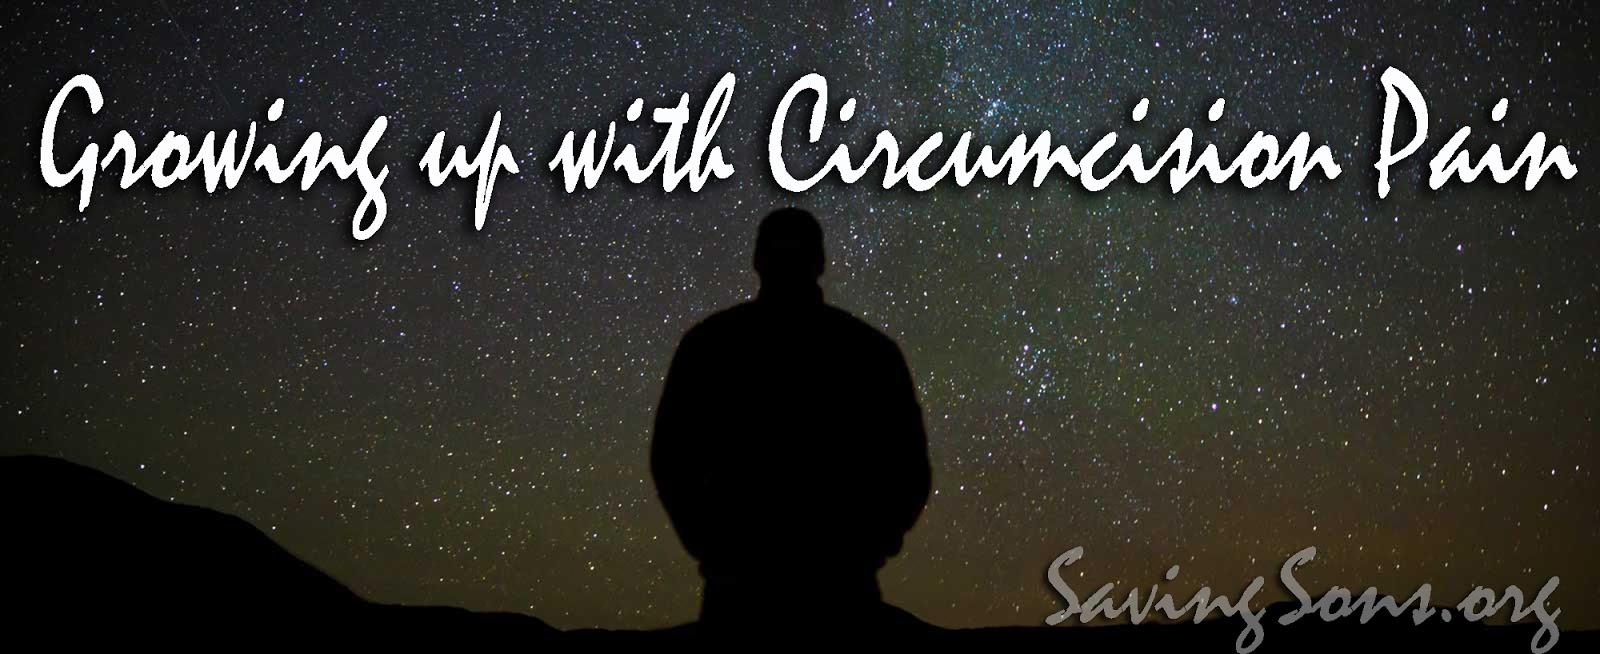 Should I include circumcision in my essay?